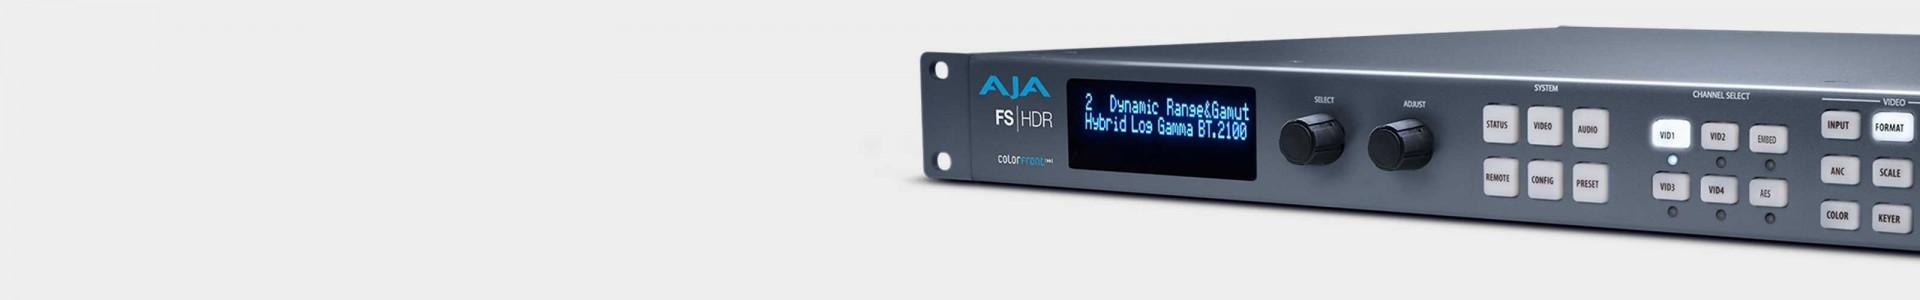 AJA Video synchronizers - Avacab official AJA dealer